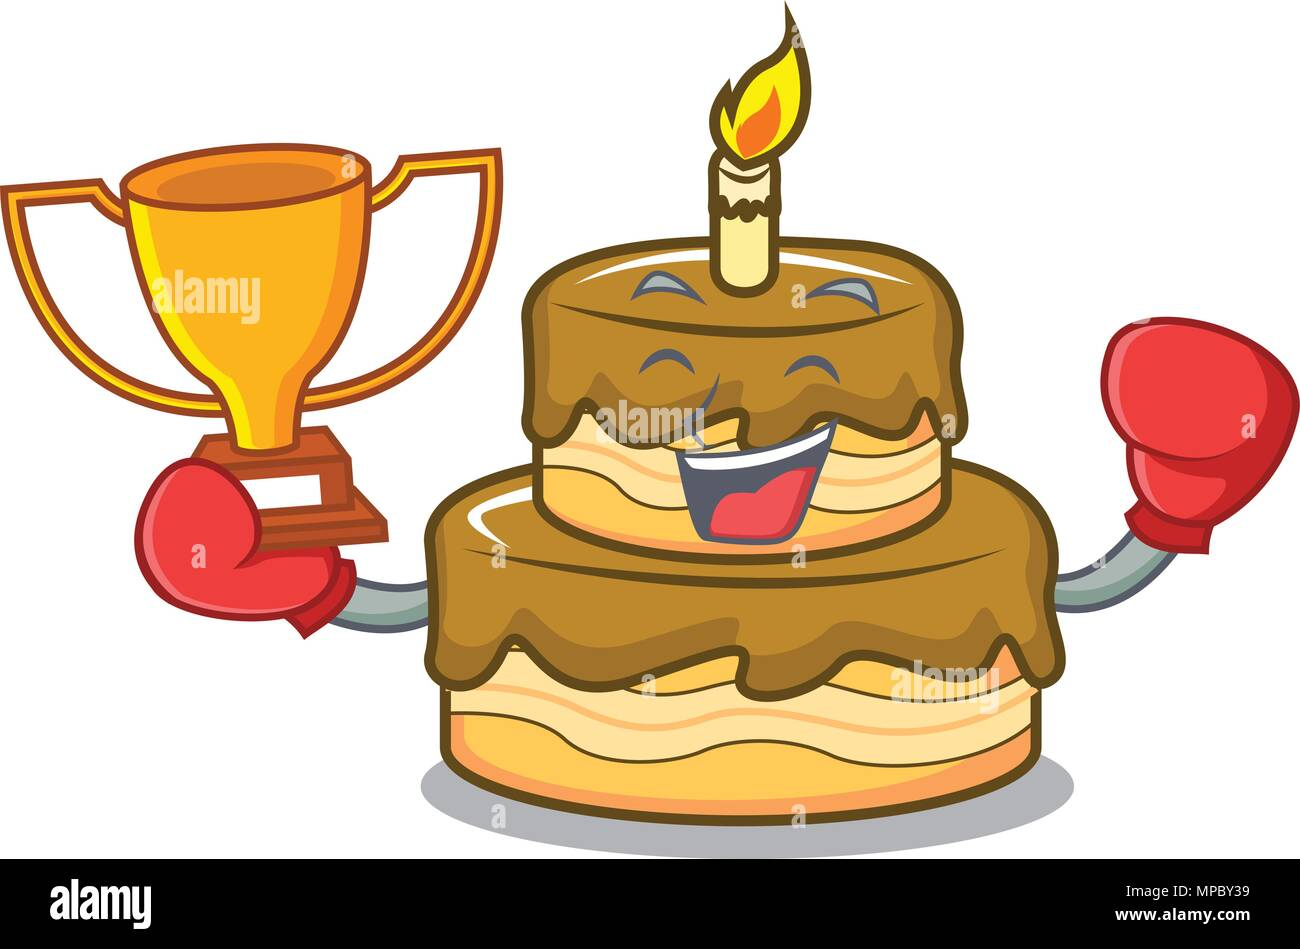 Peachy Boxing Winner Birthday Cake Mascot Cartoon Stock Vector Art Birthday Cards Printable Inklcafe Filternl